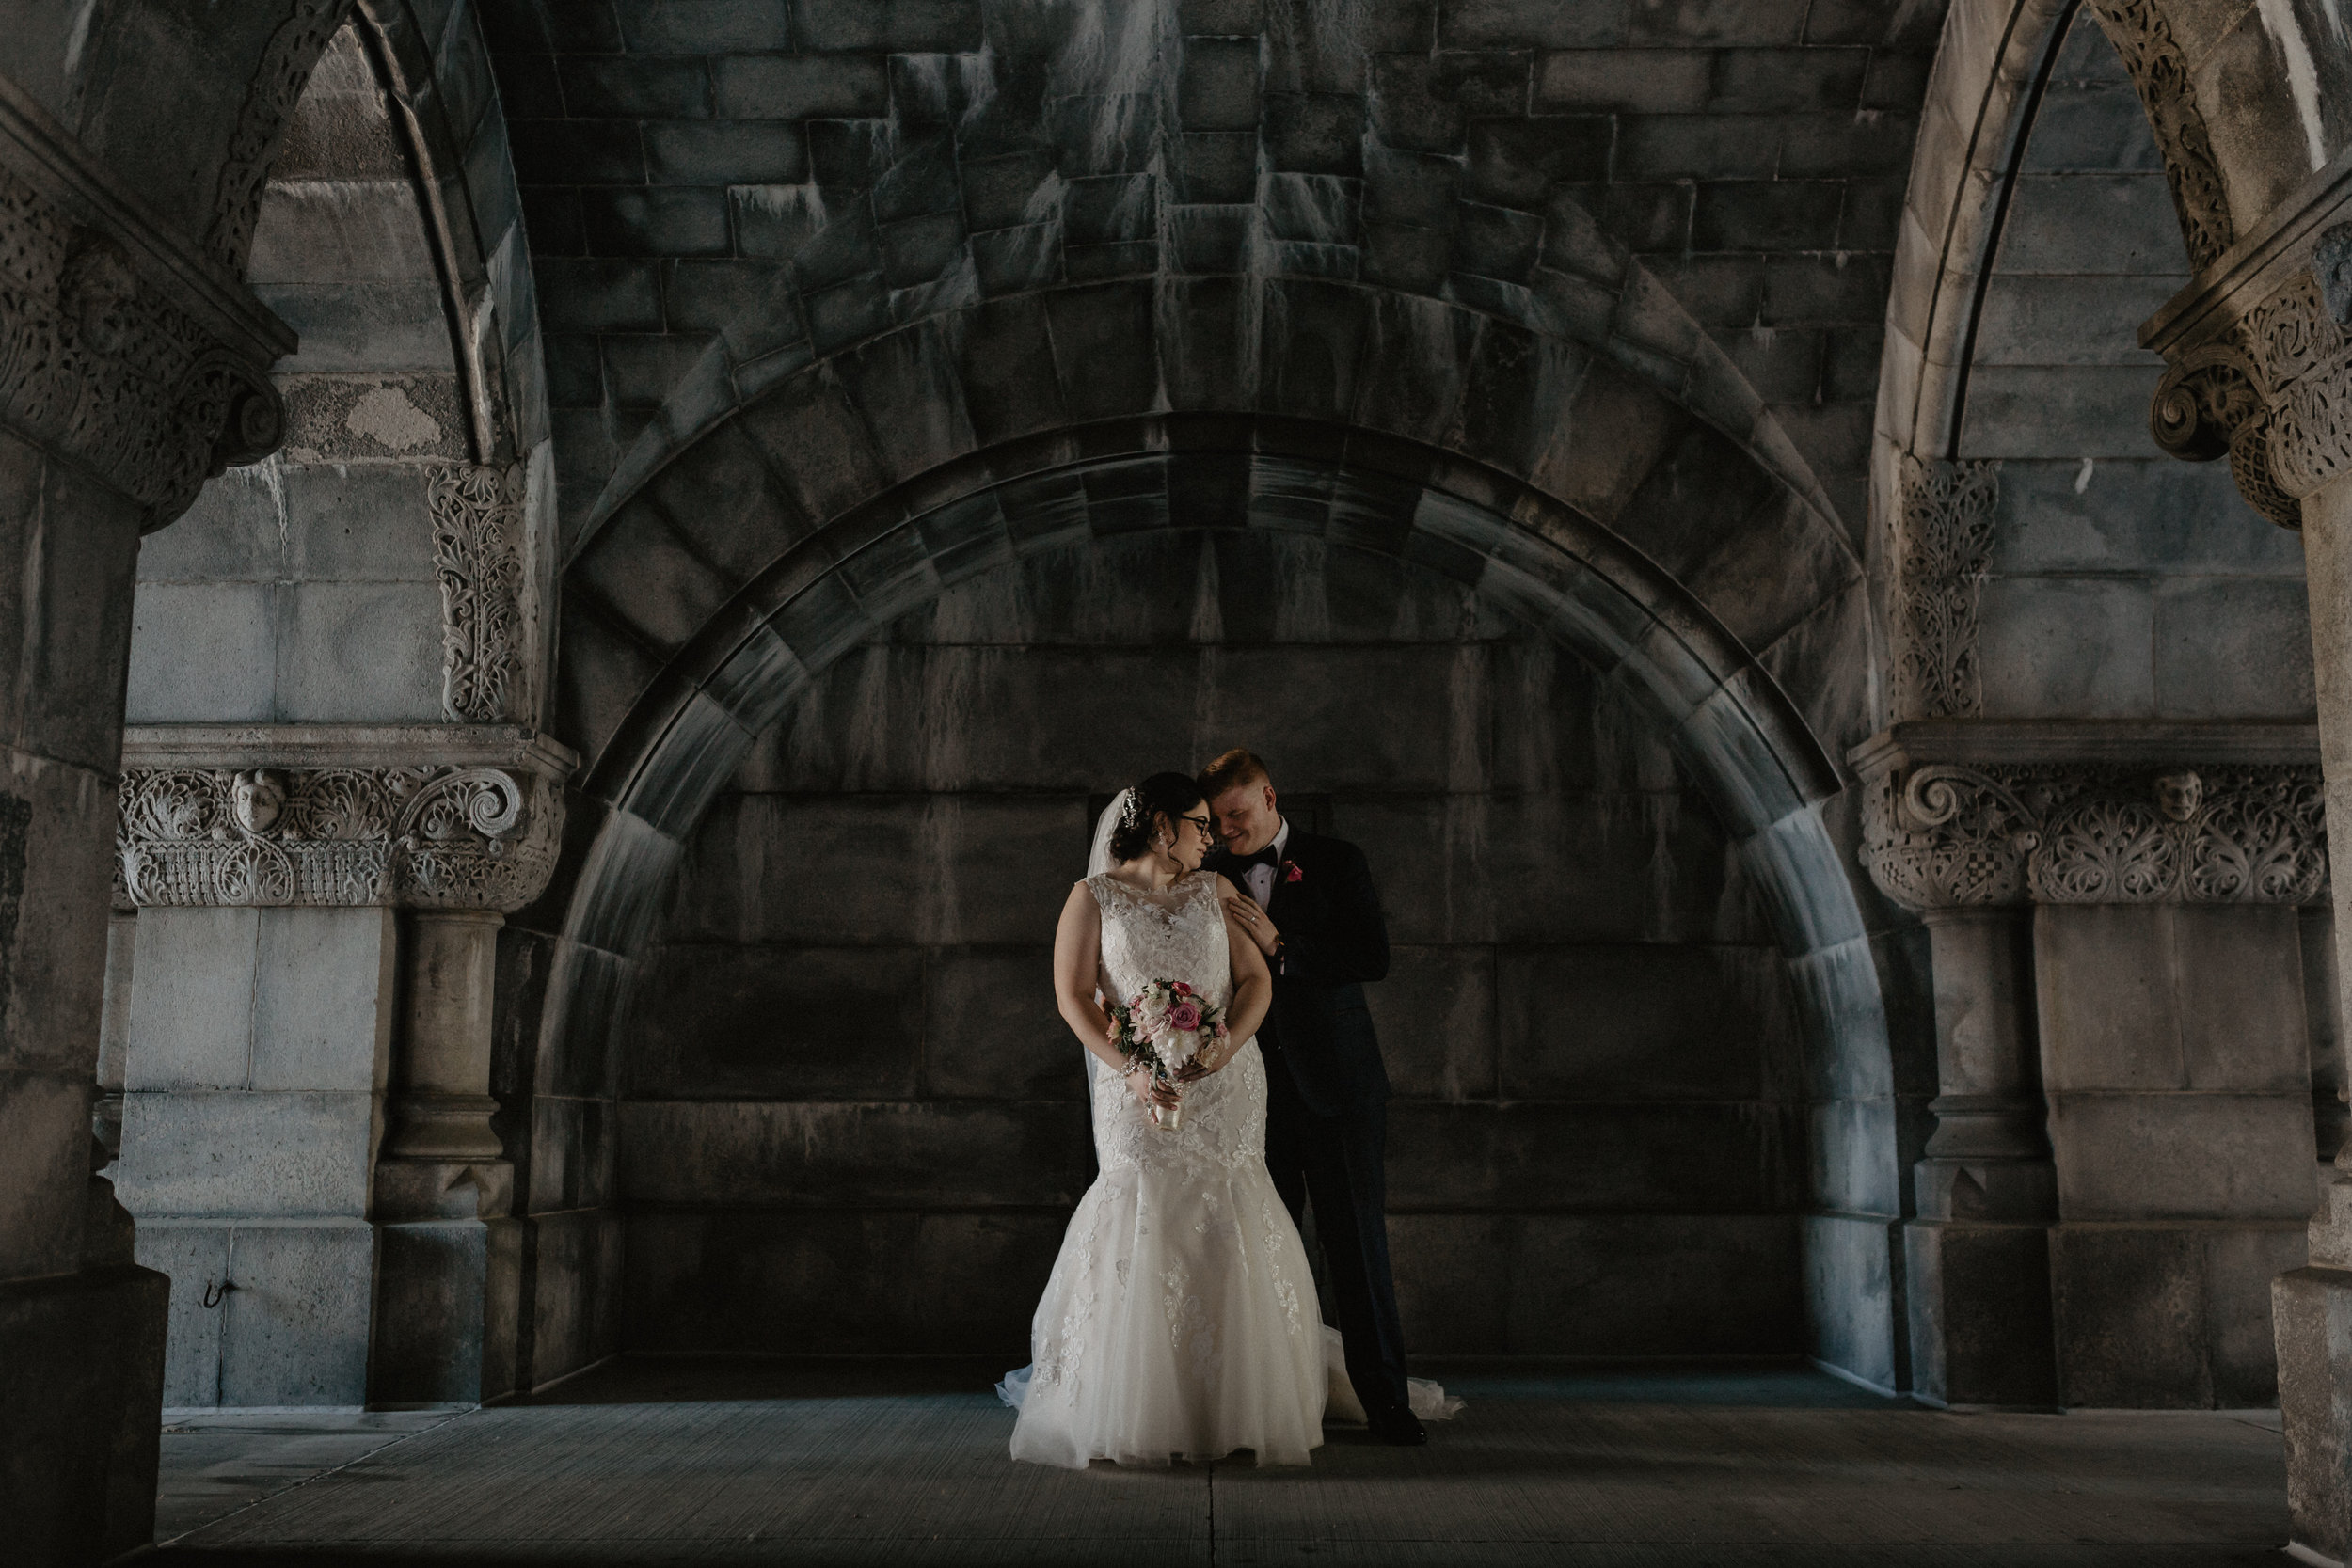 albany-new-york-wedding-35.jpg